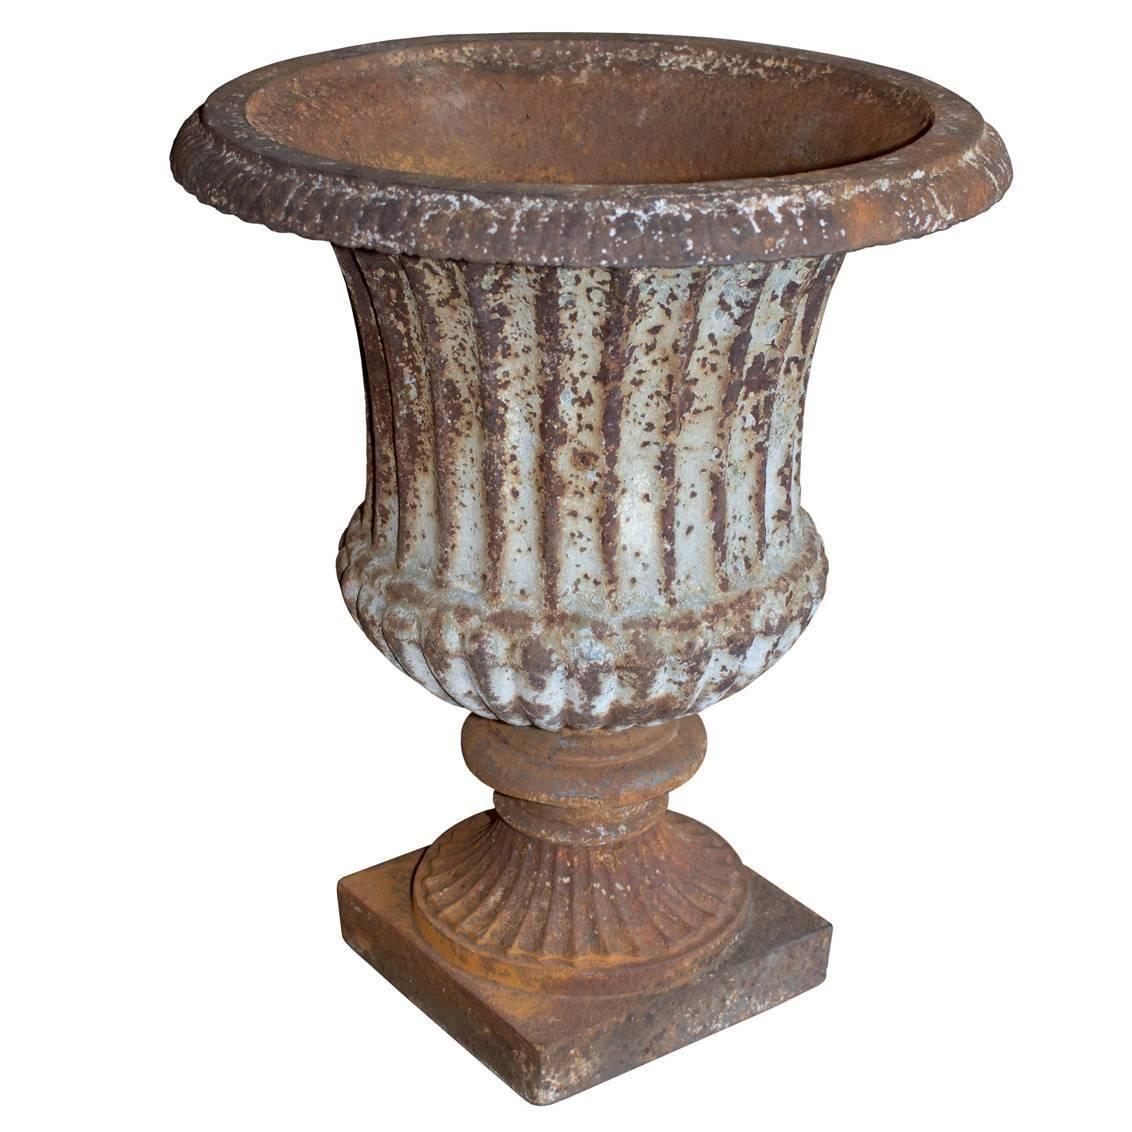 Antique English Cast Iron Urn